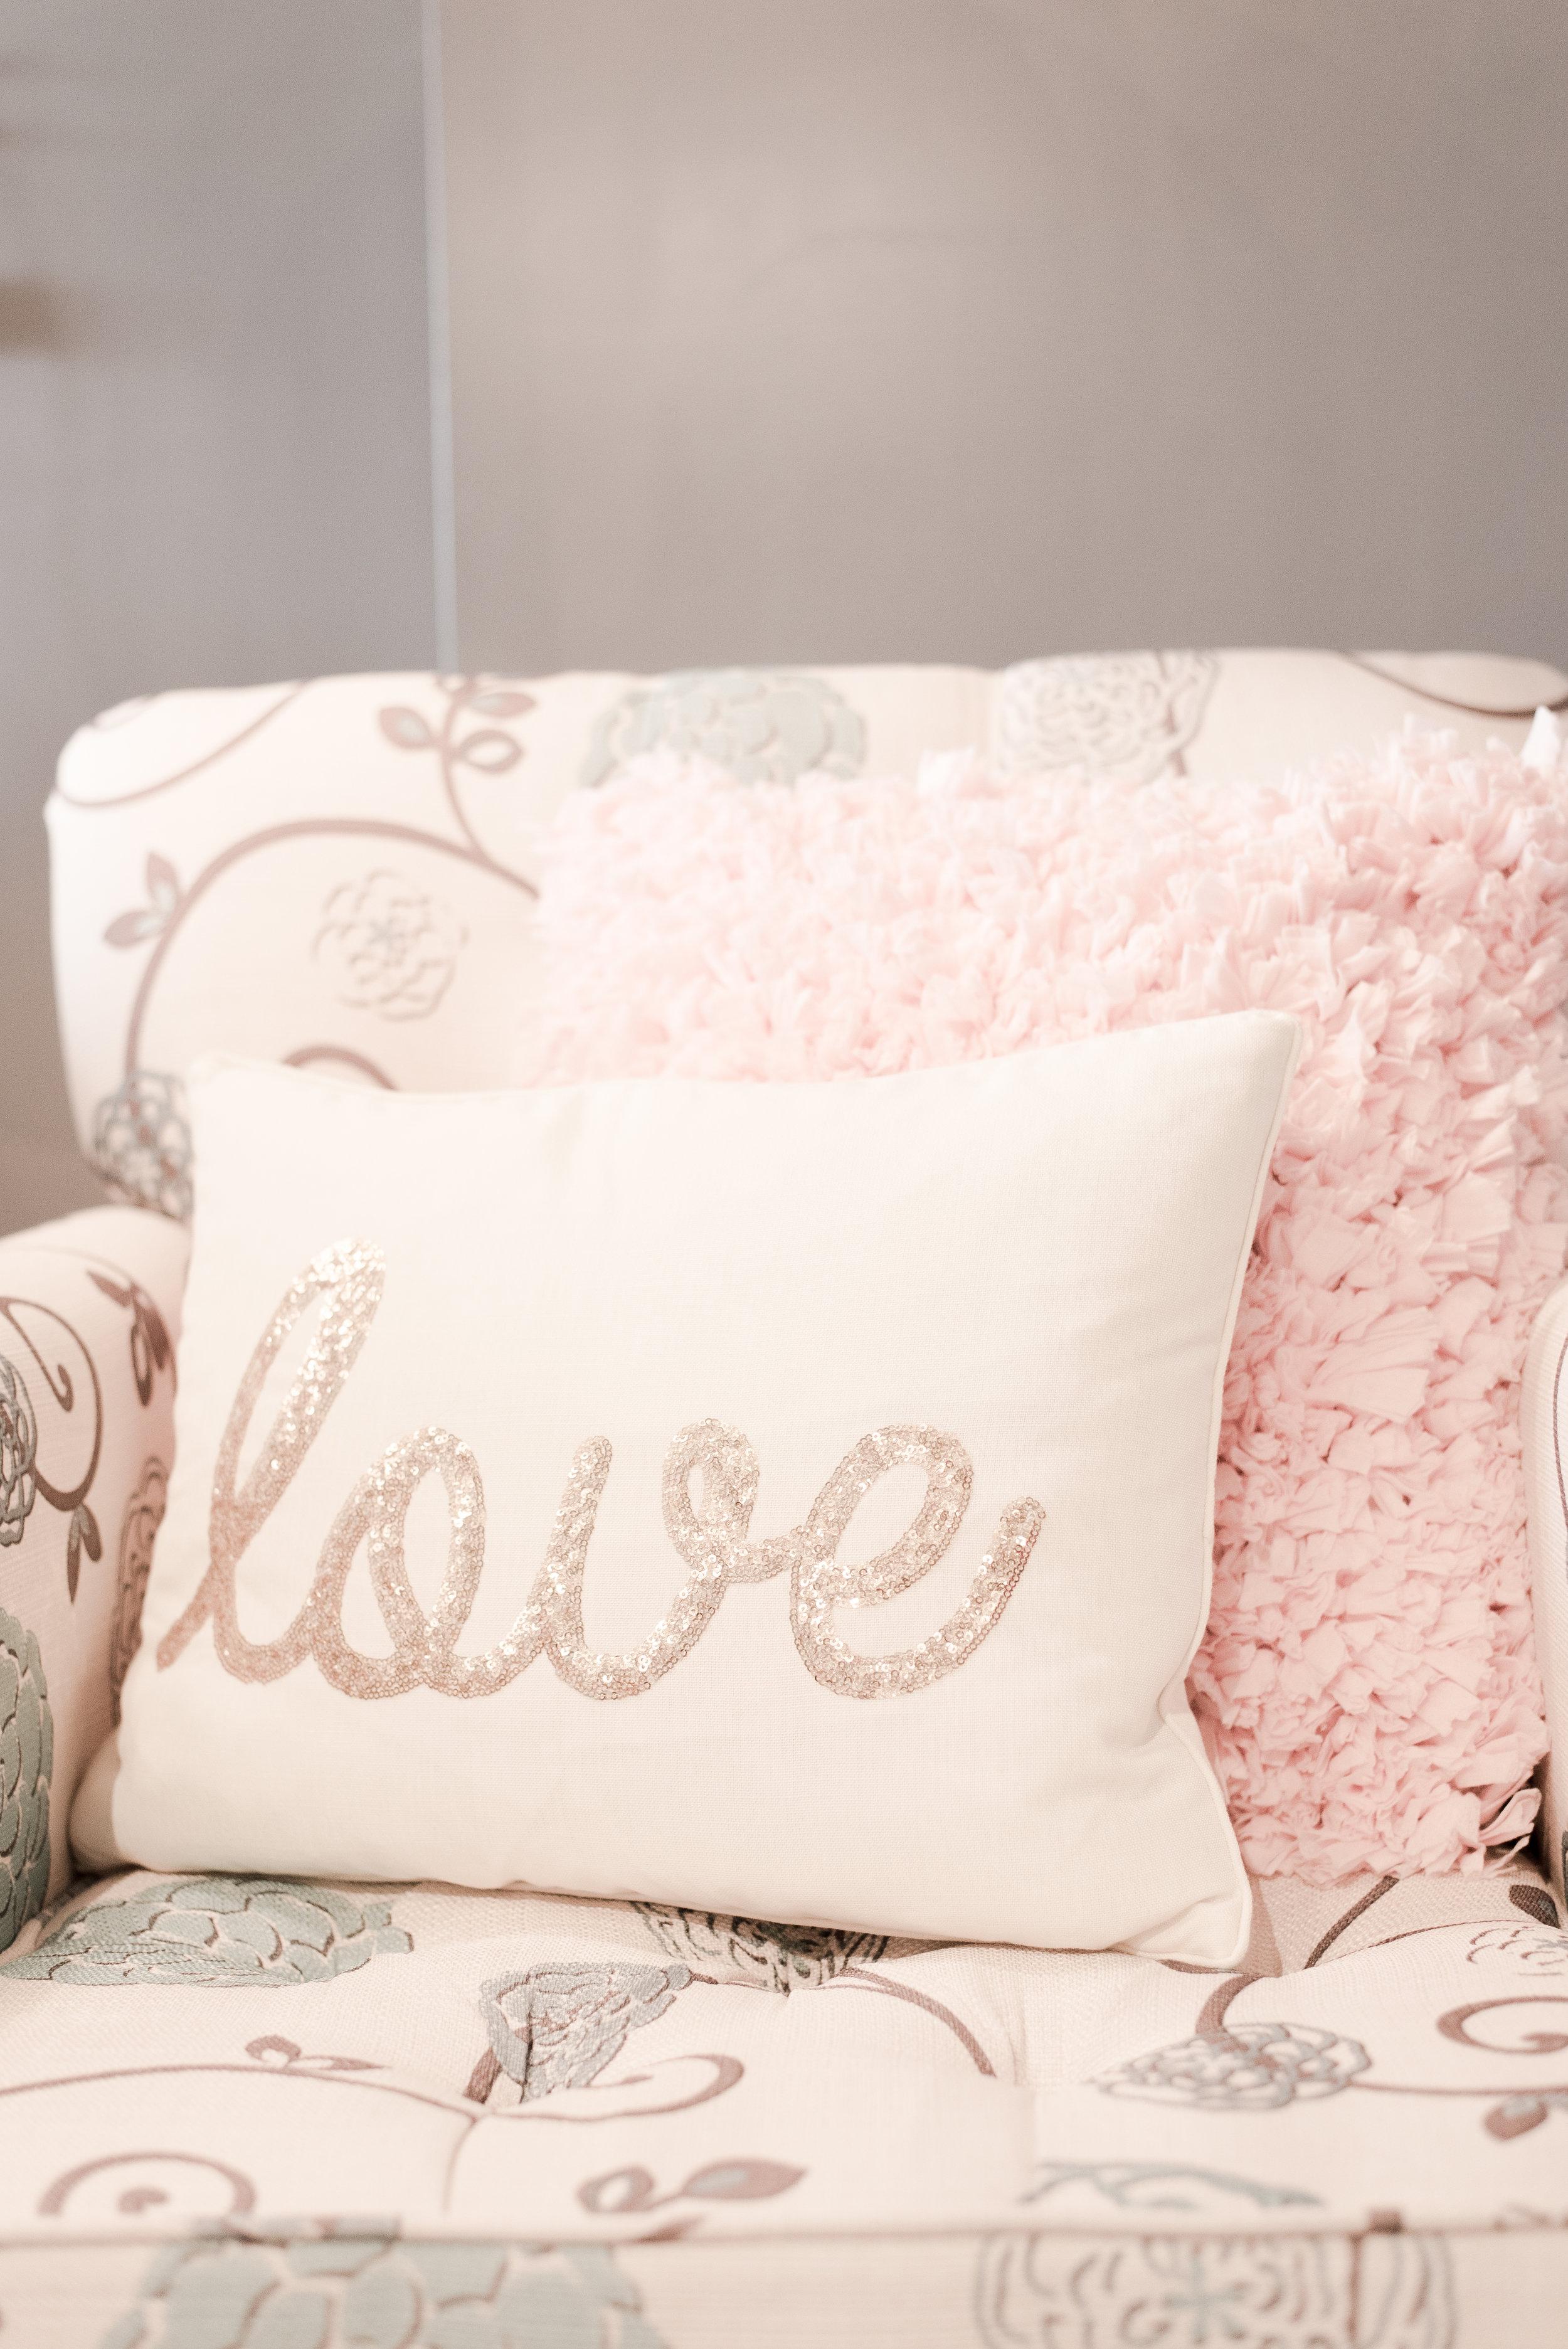 throw pillow detail